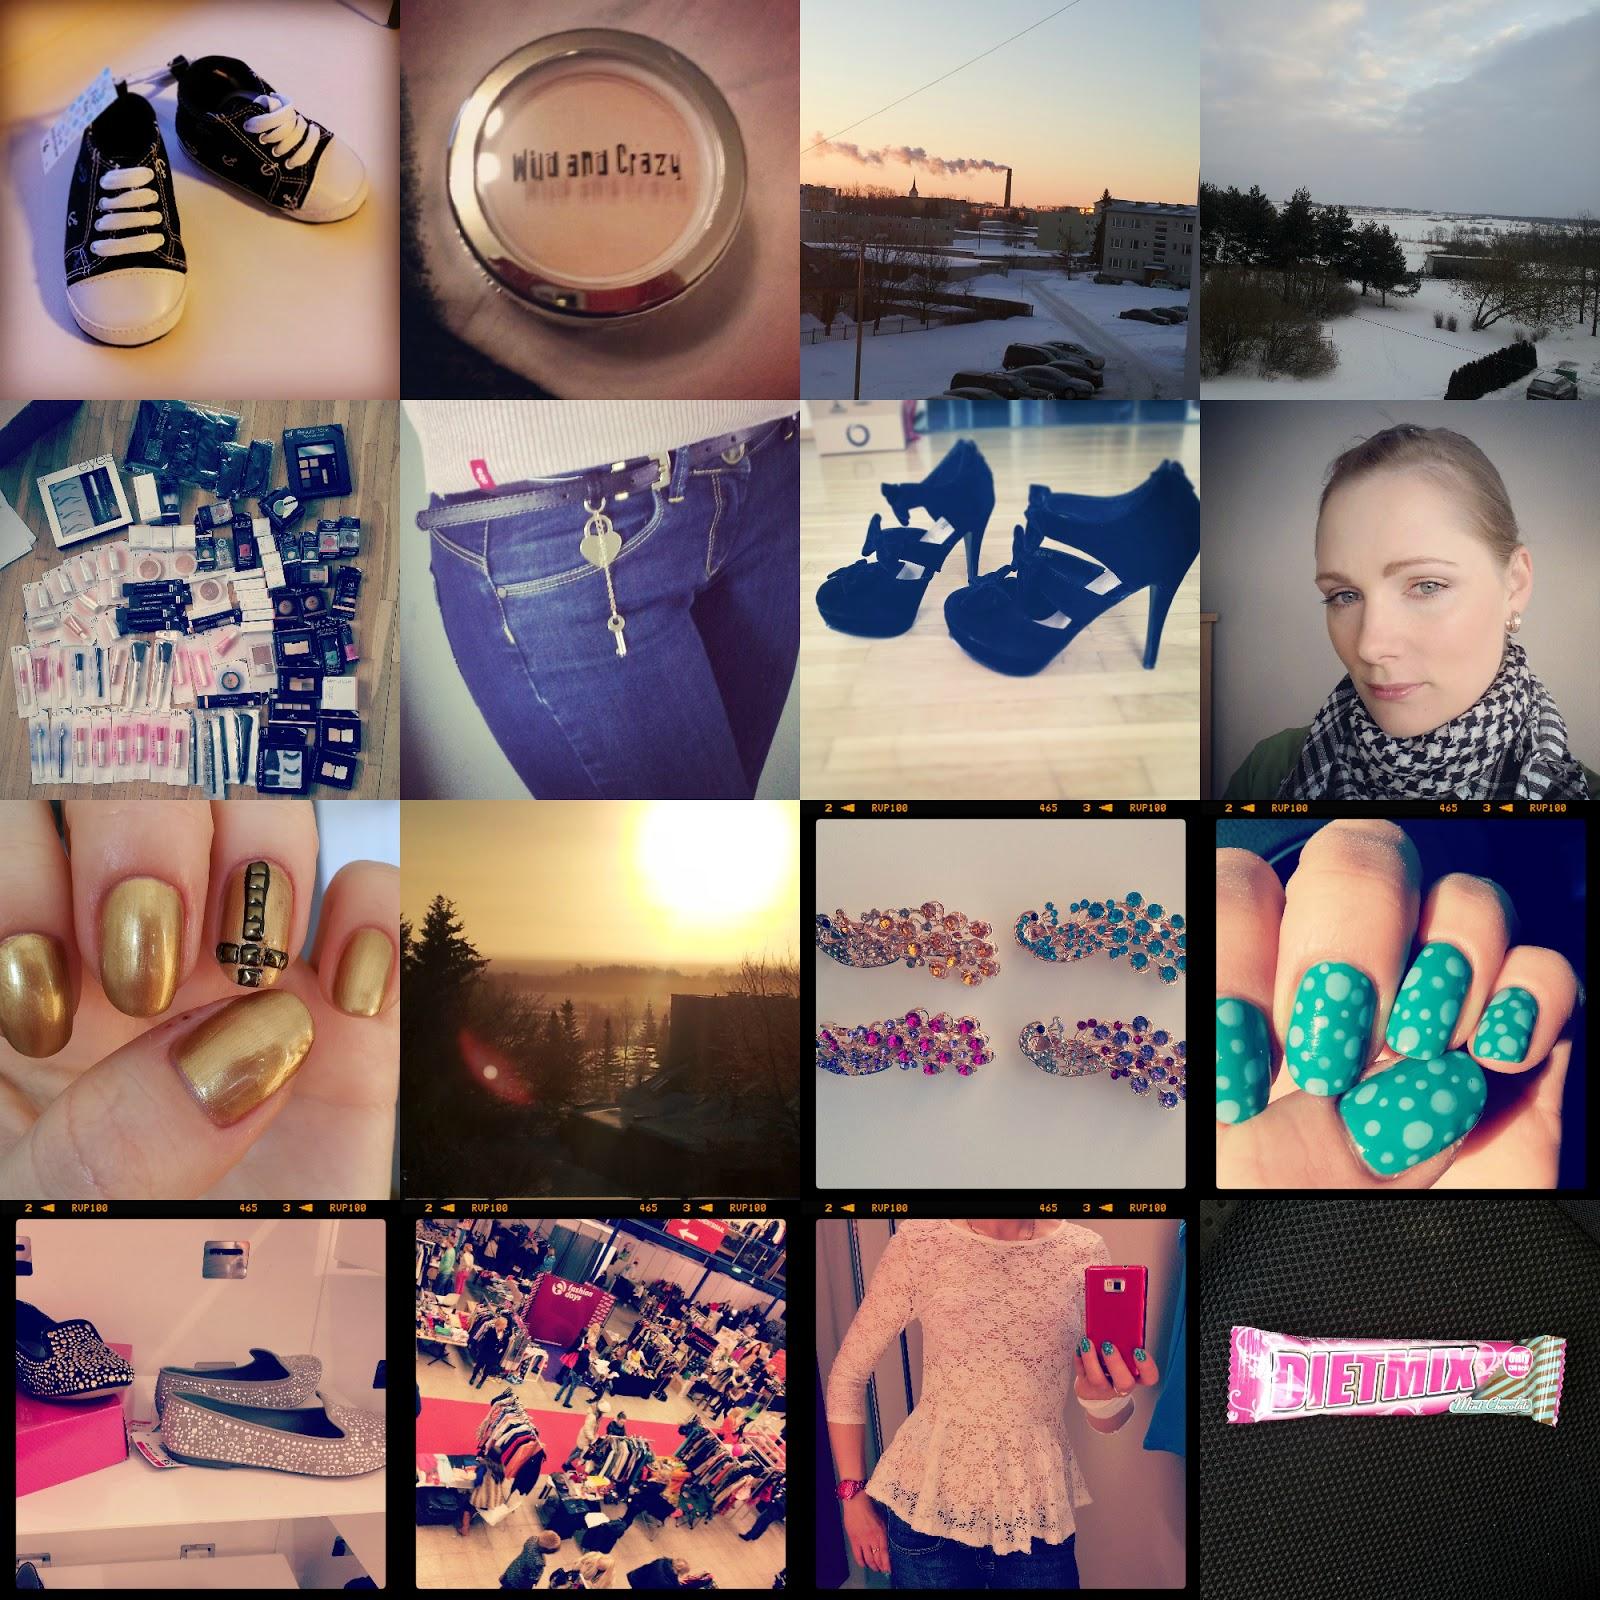 life in instagram pics